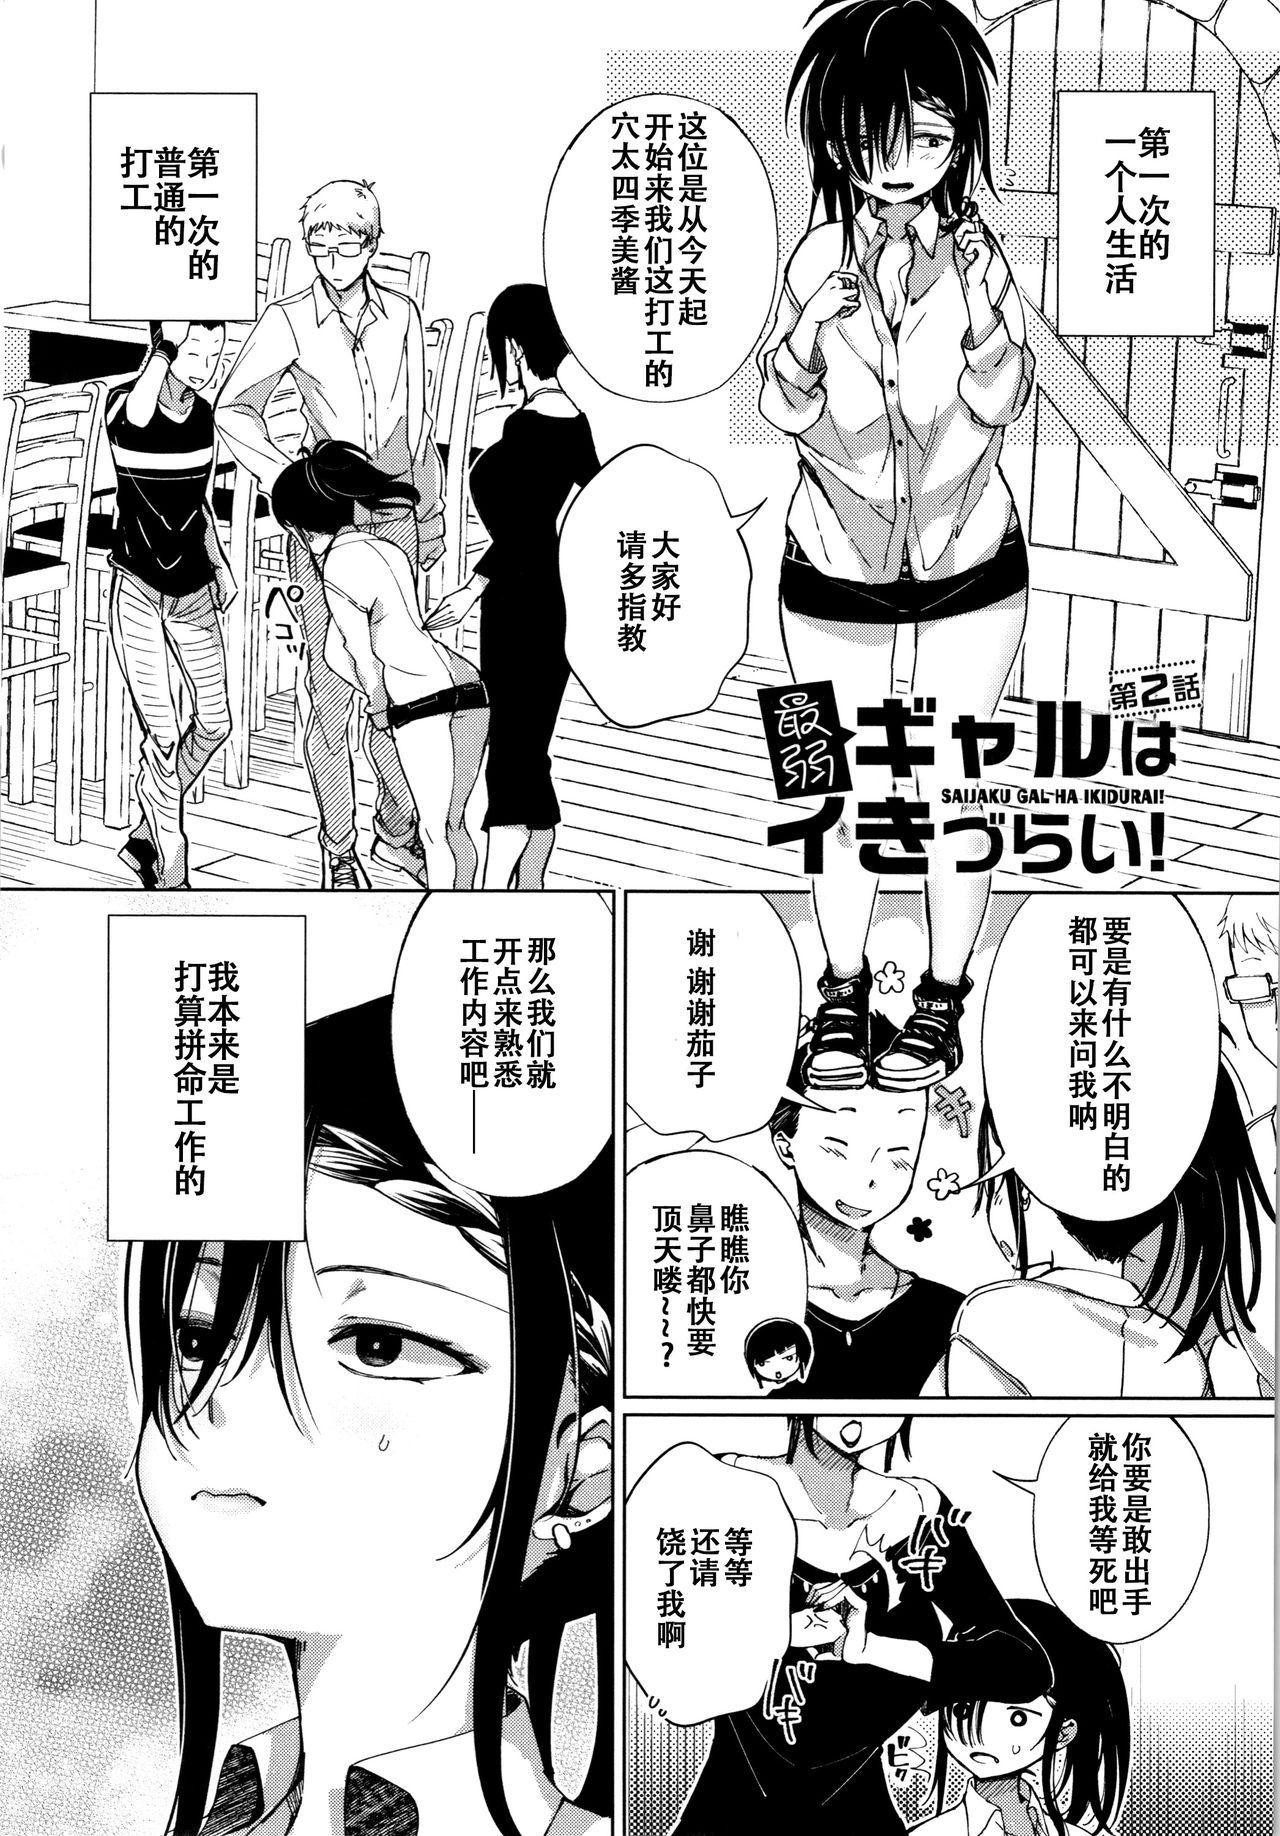 [Achumuchi] Saijaku Gal wa Ikizurai! - The weakest pussy is hard to go.ch.1-3 [Chinese] [战栗的玻璃棒汉化] [Ongoing] 29